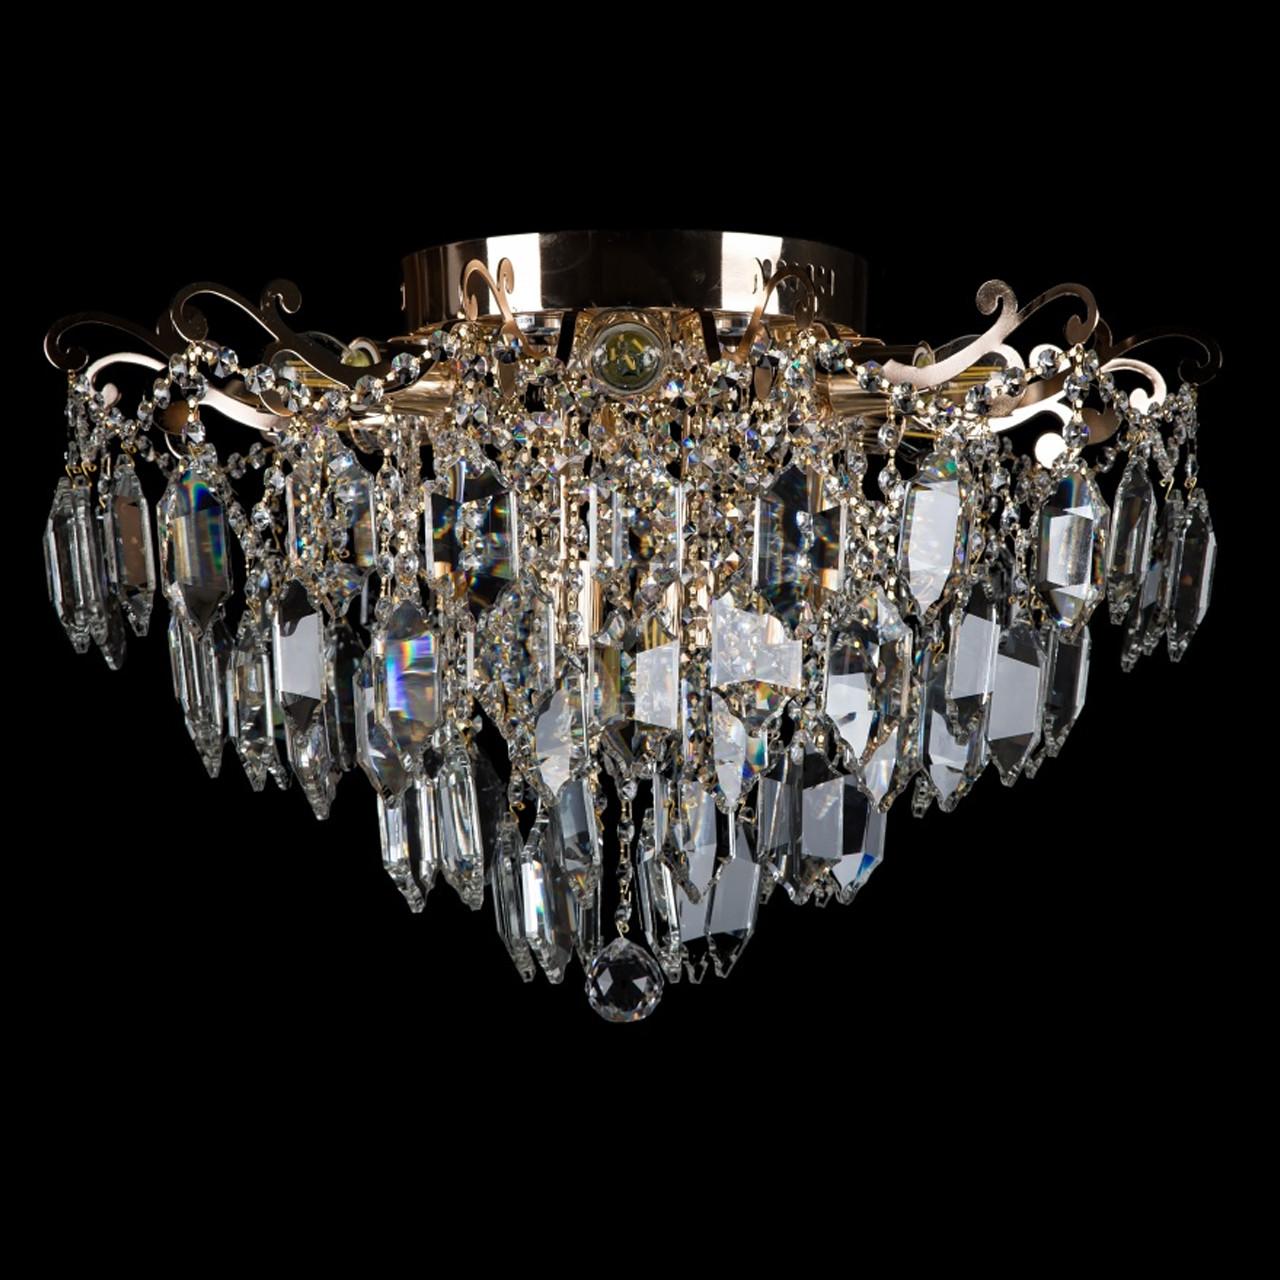 Хрустальная люстра СветМира на 8 лампочек со встроенной LED подсветкой рожков VL-2944/8+6 LED (FG)